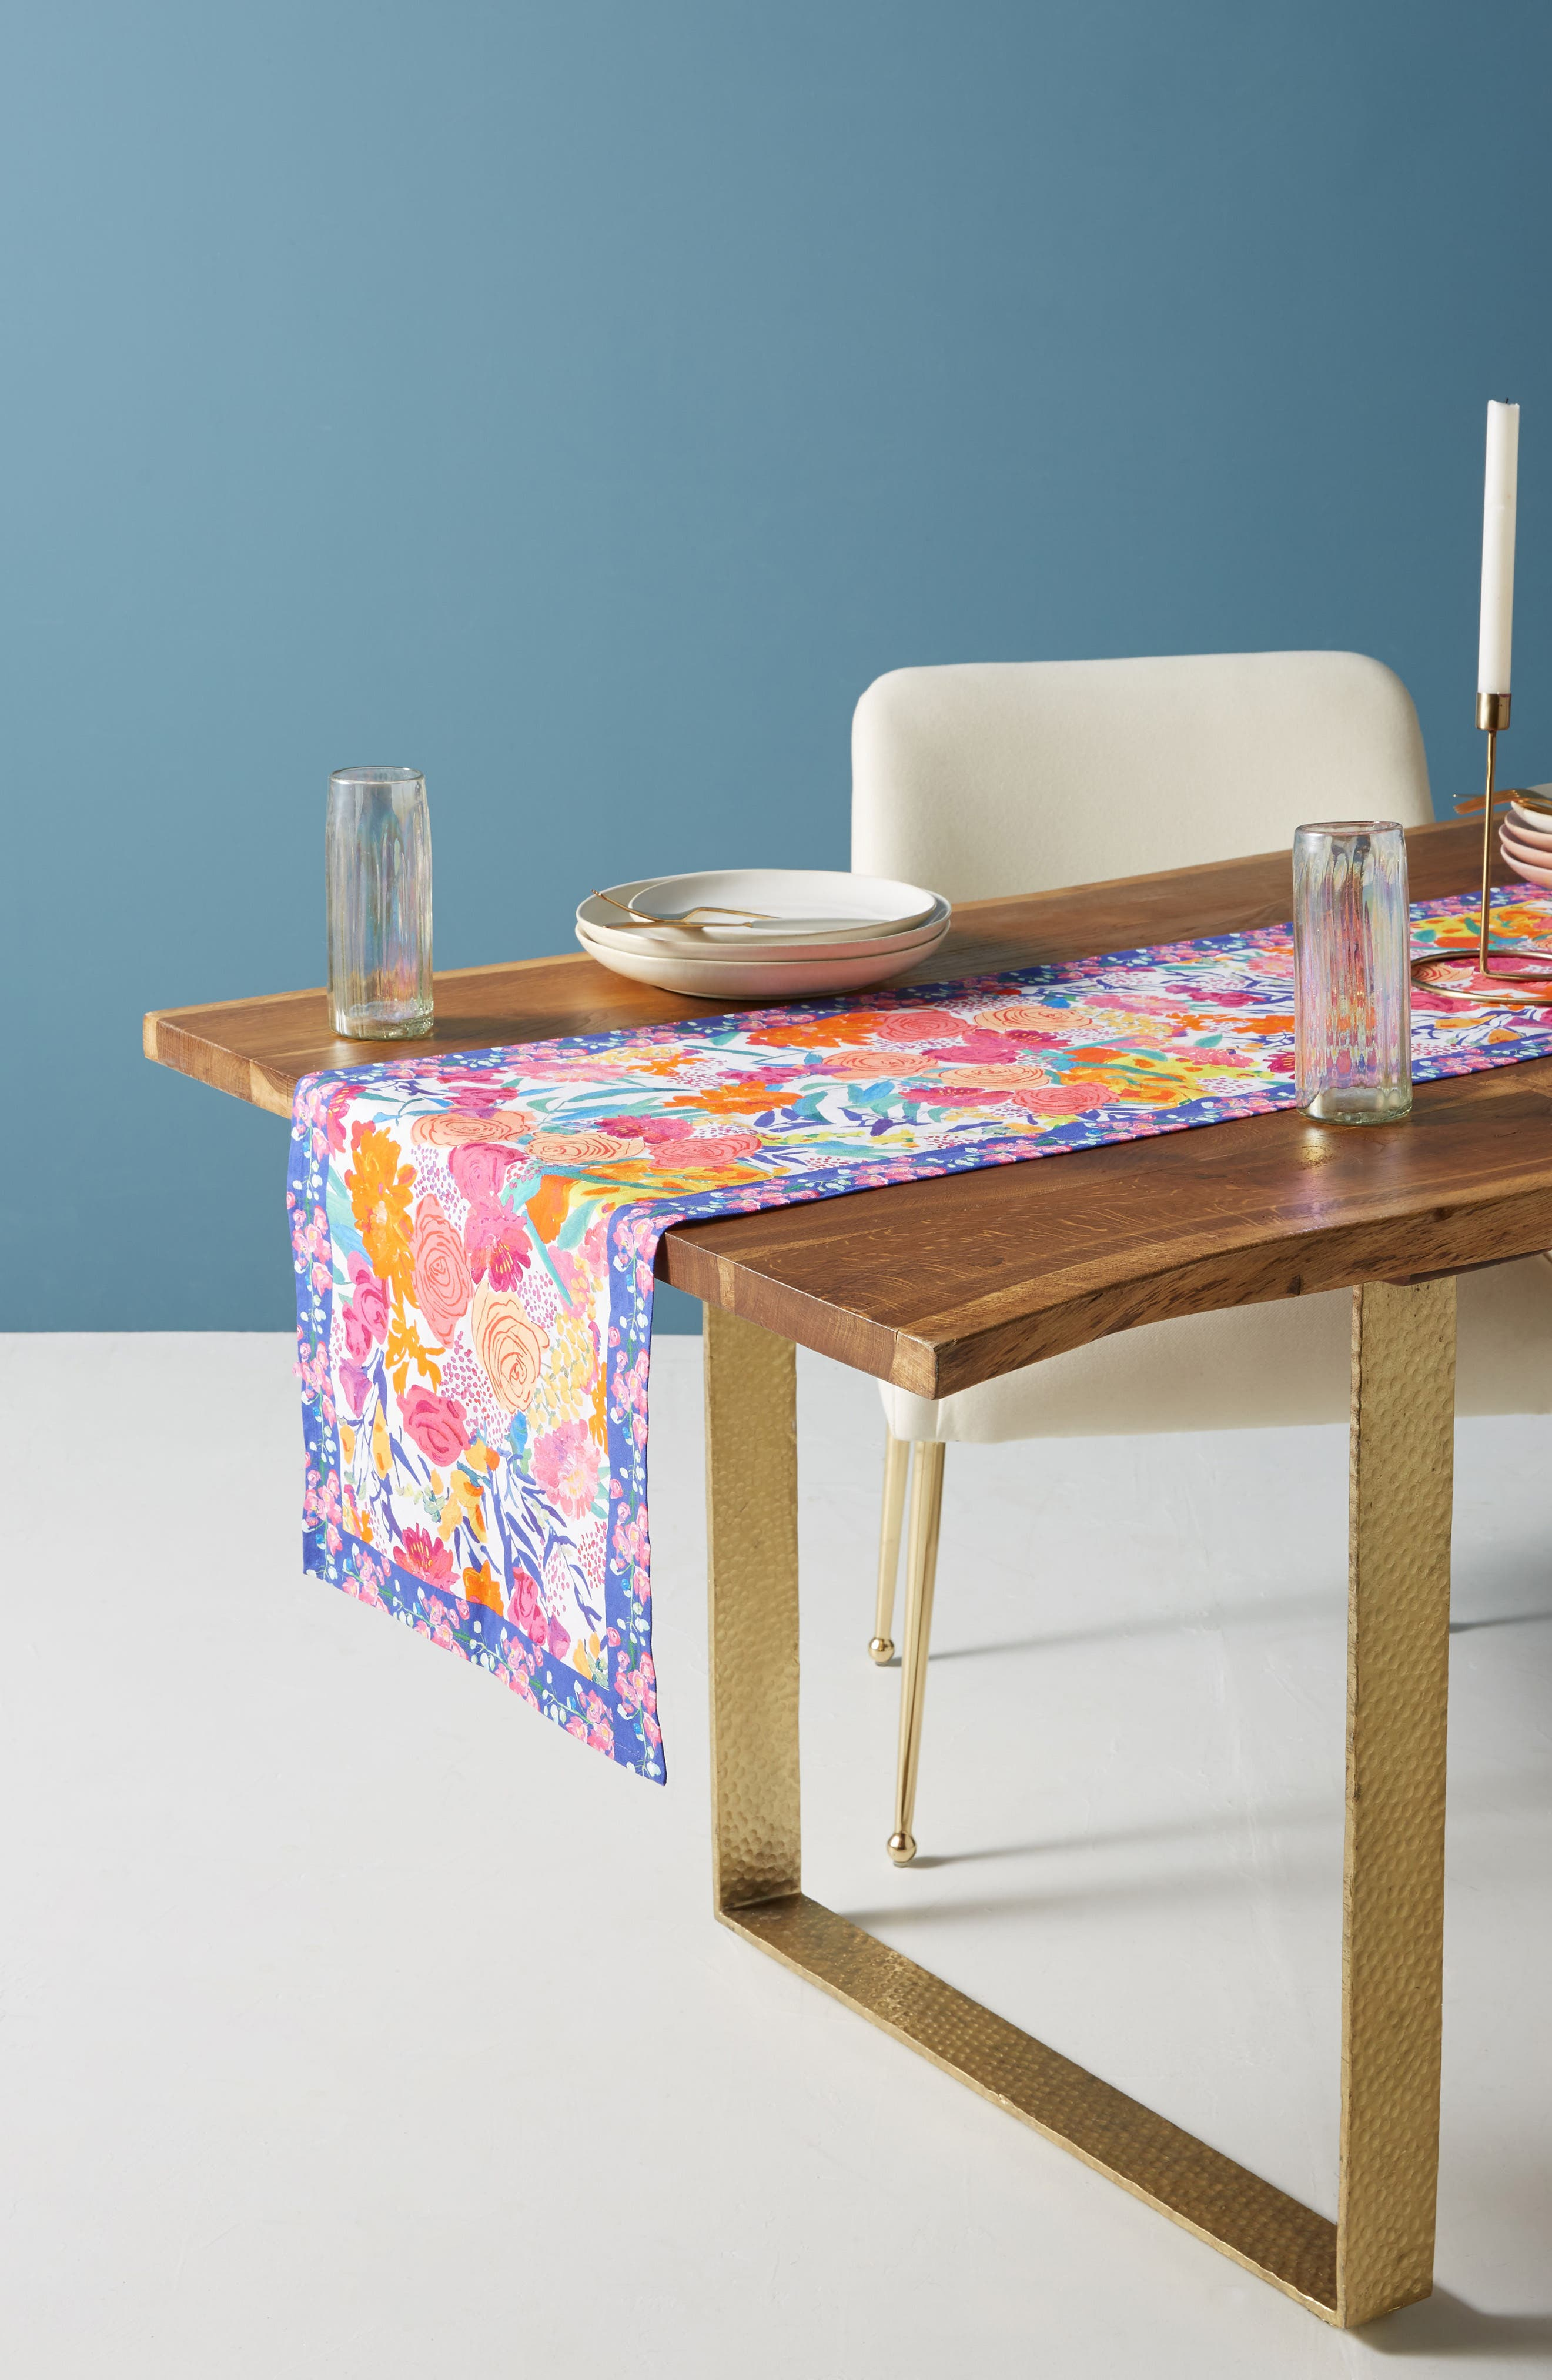 Paint + Petals Table Runner,                             Main thumbnail 1, color,                             White Multi